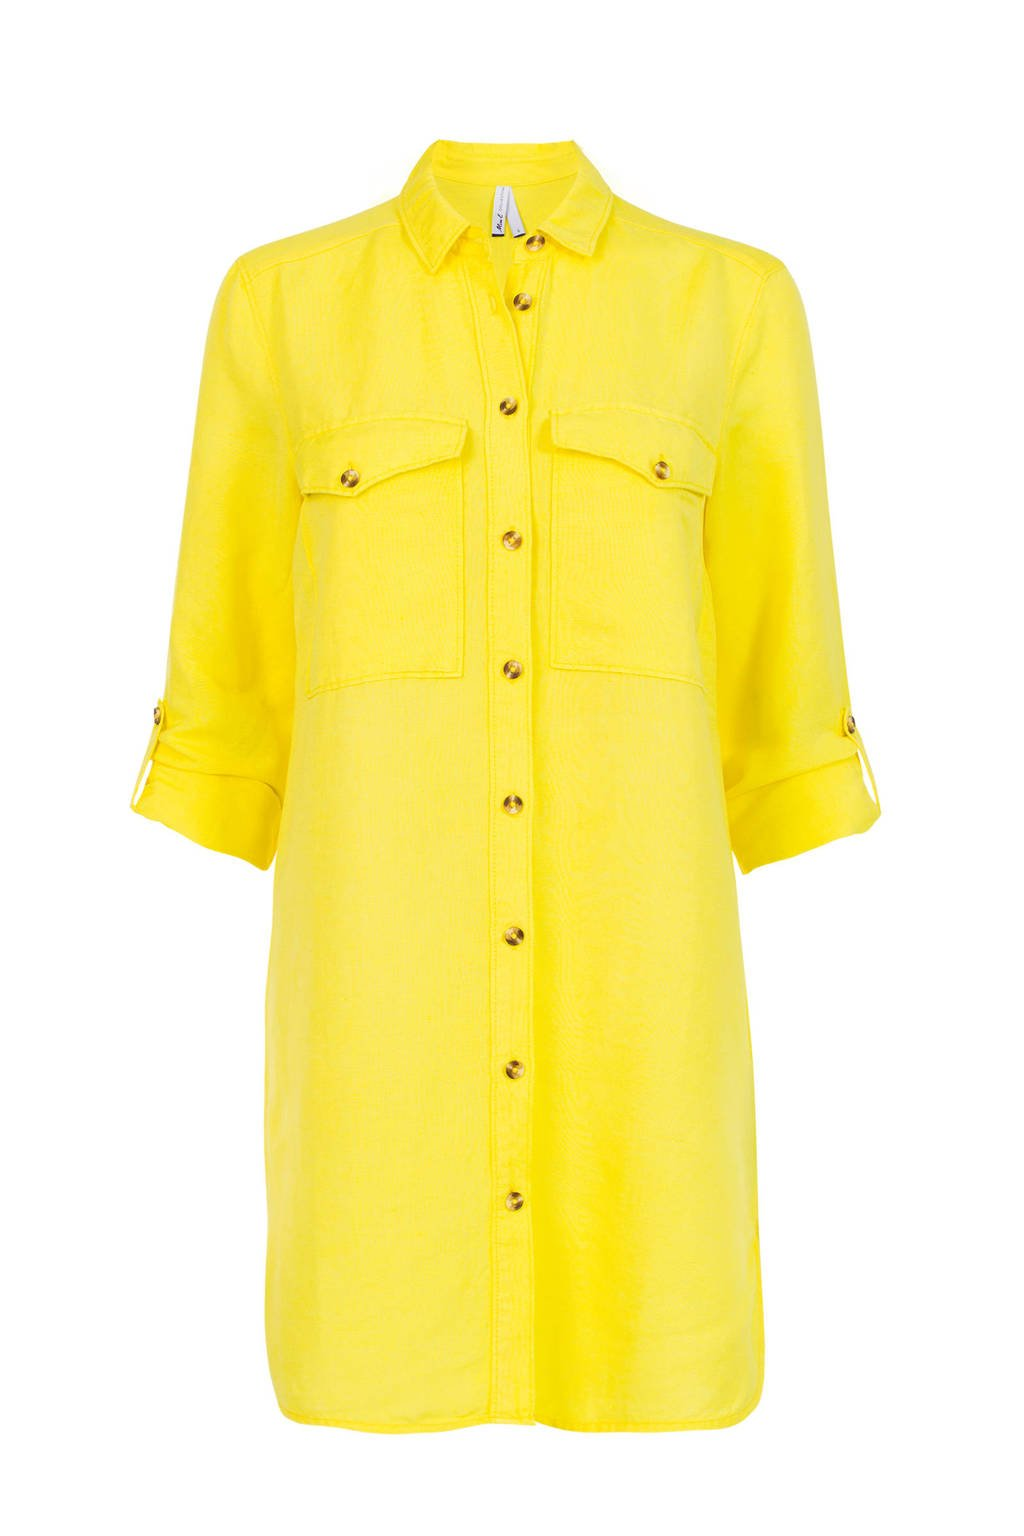 Miss Etam Regulier blouse met linnen geel, Geel